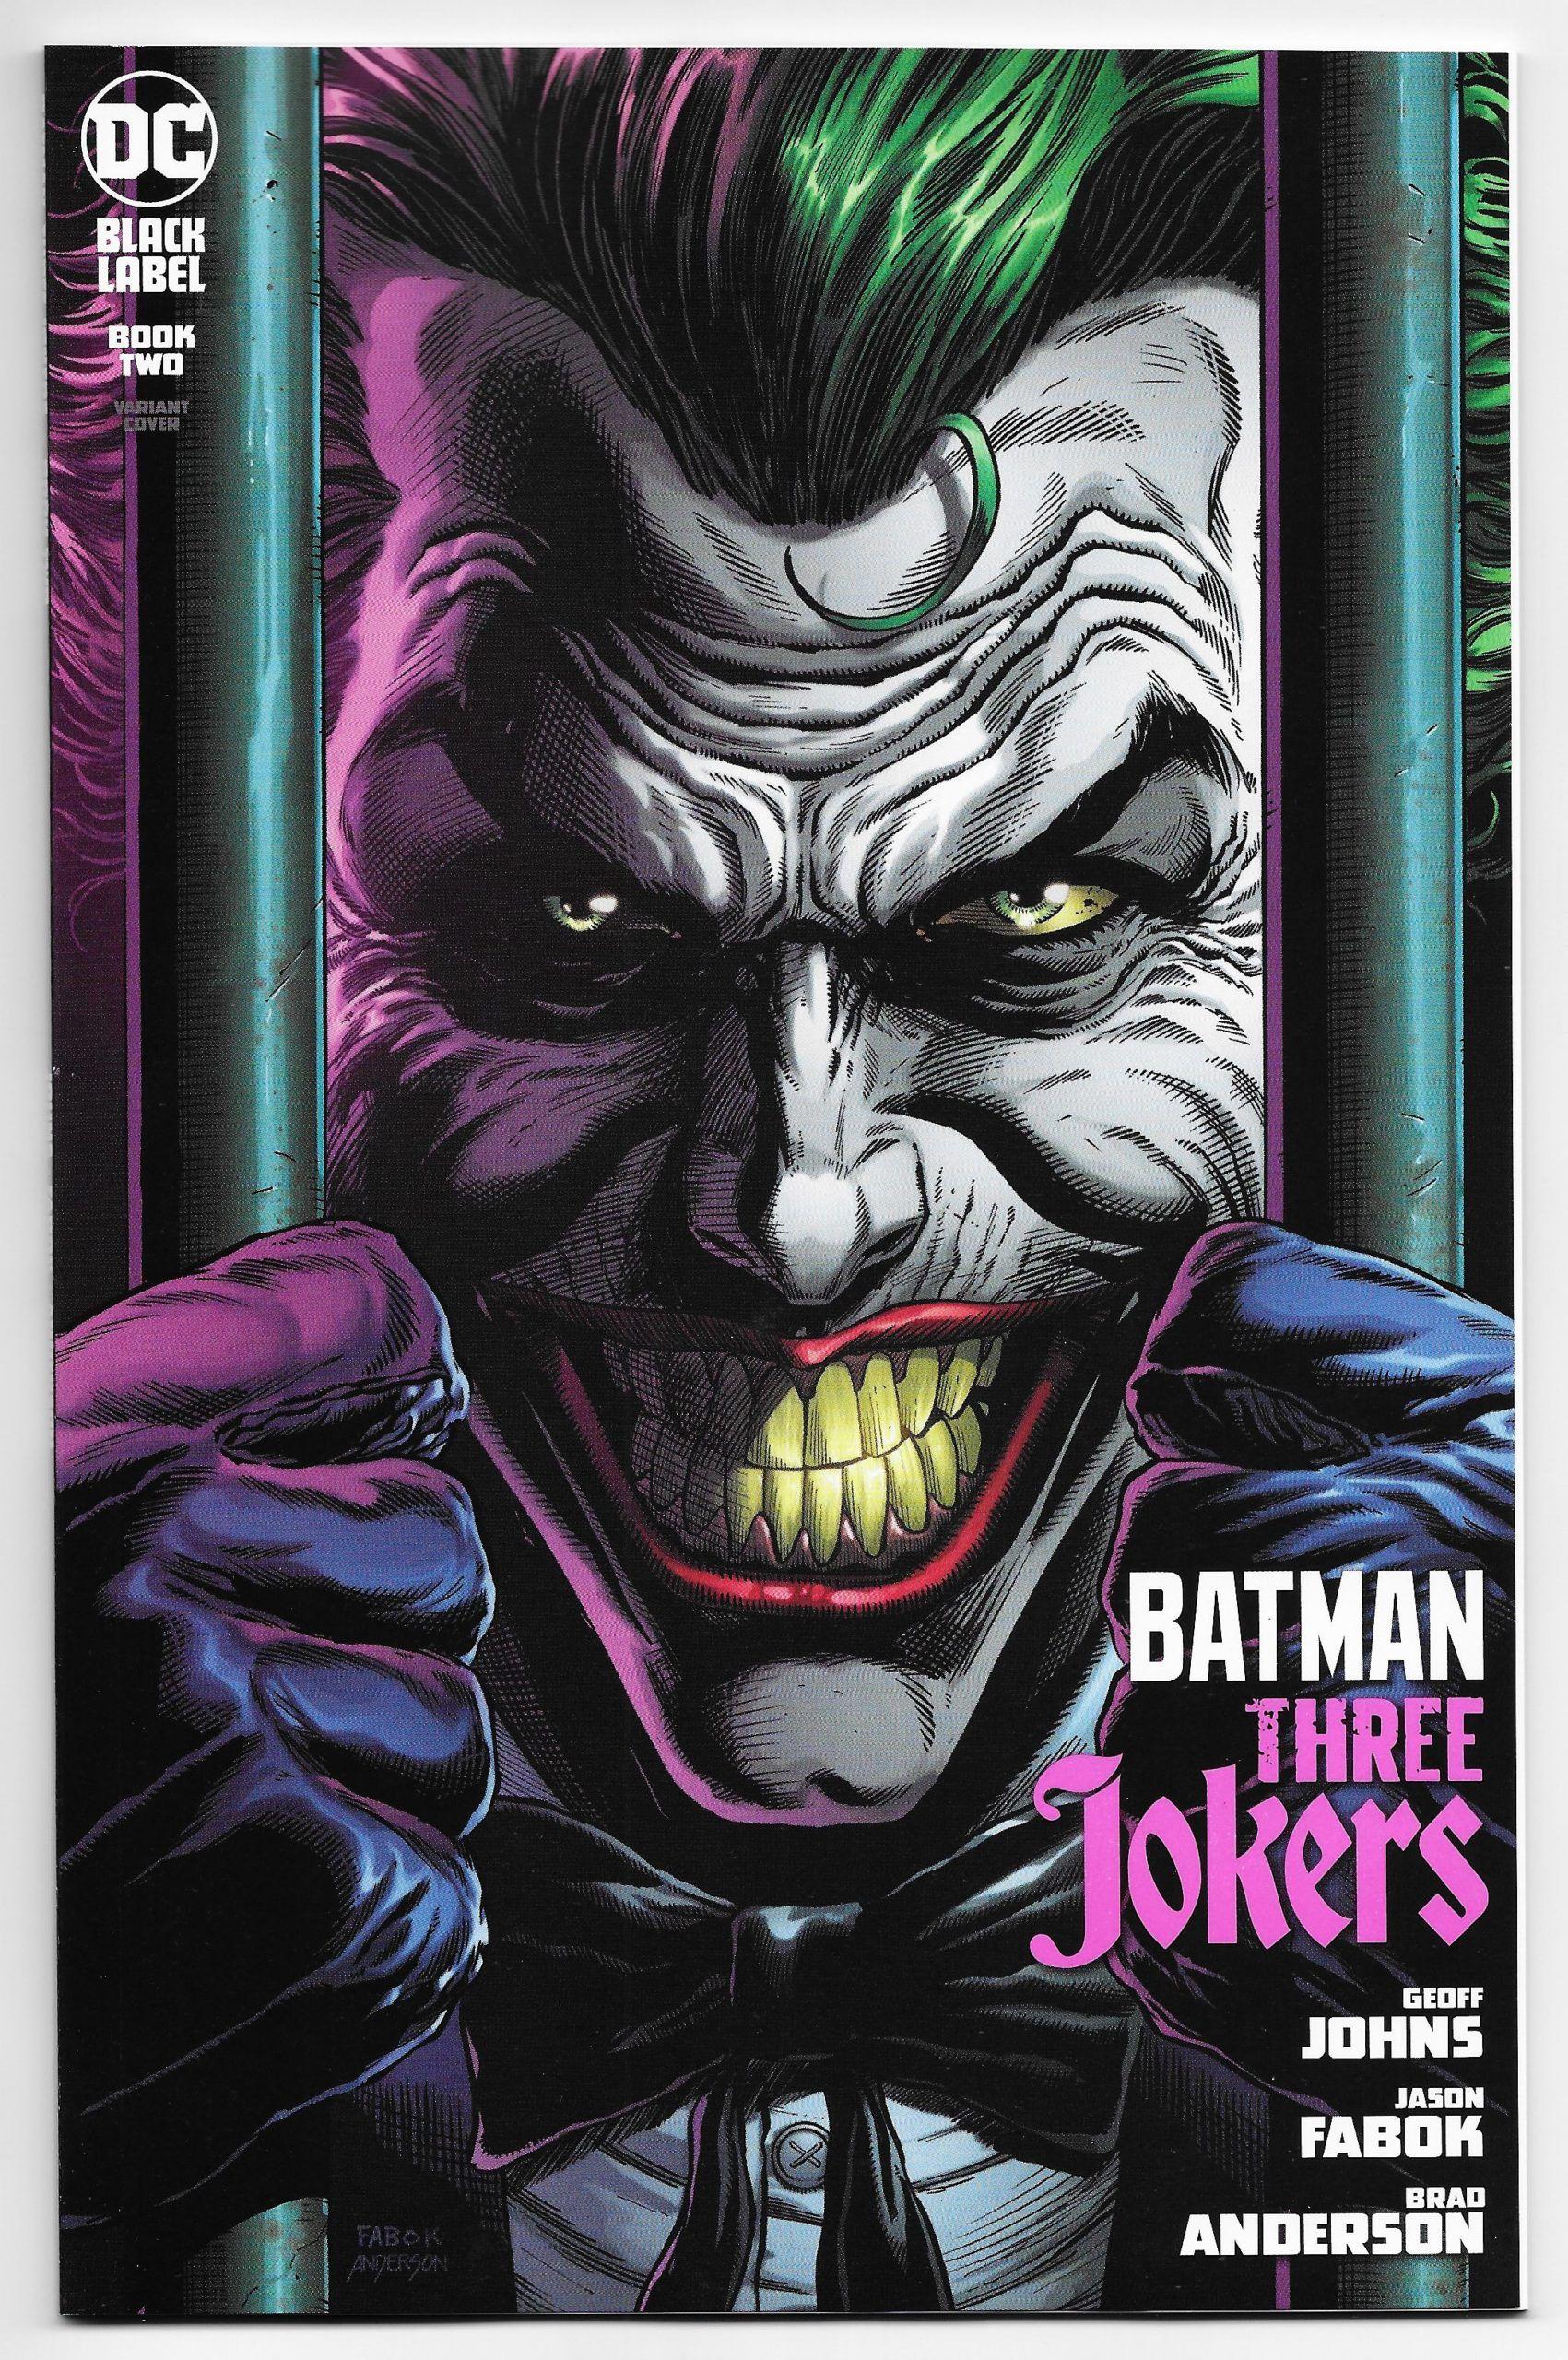 BATMAN THREE JOKERS #2 Jason Fabok Premium Variant Set of 3 DC Comic Book NM